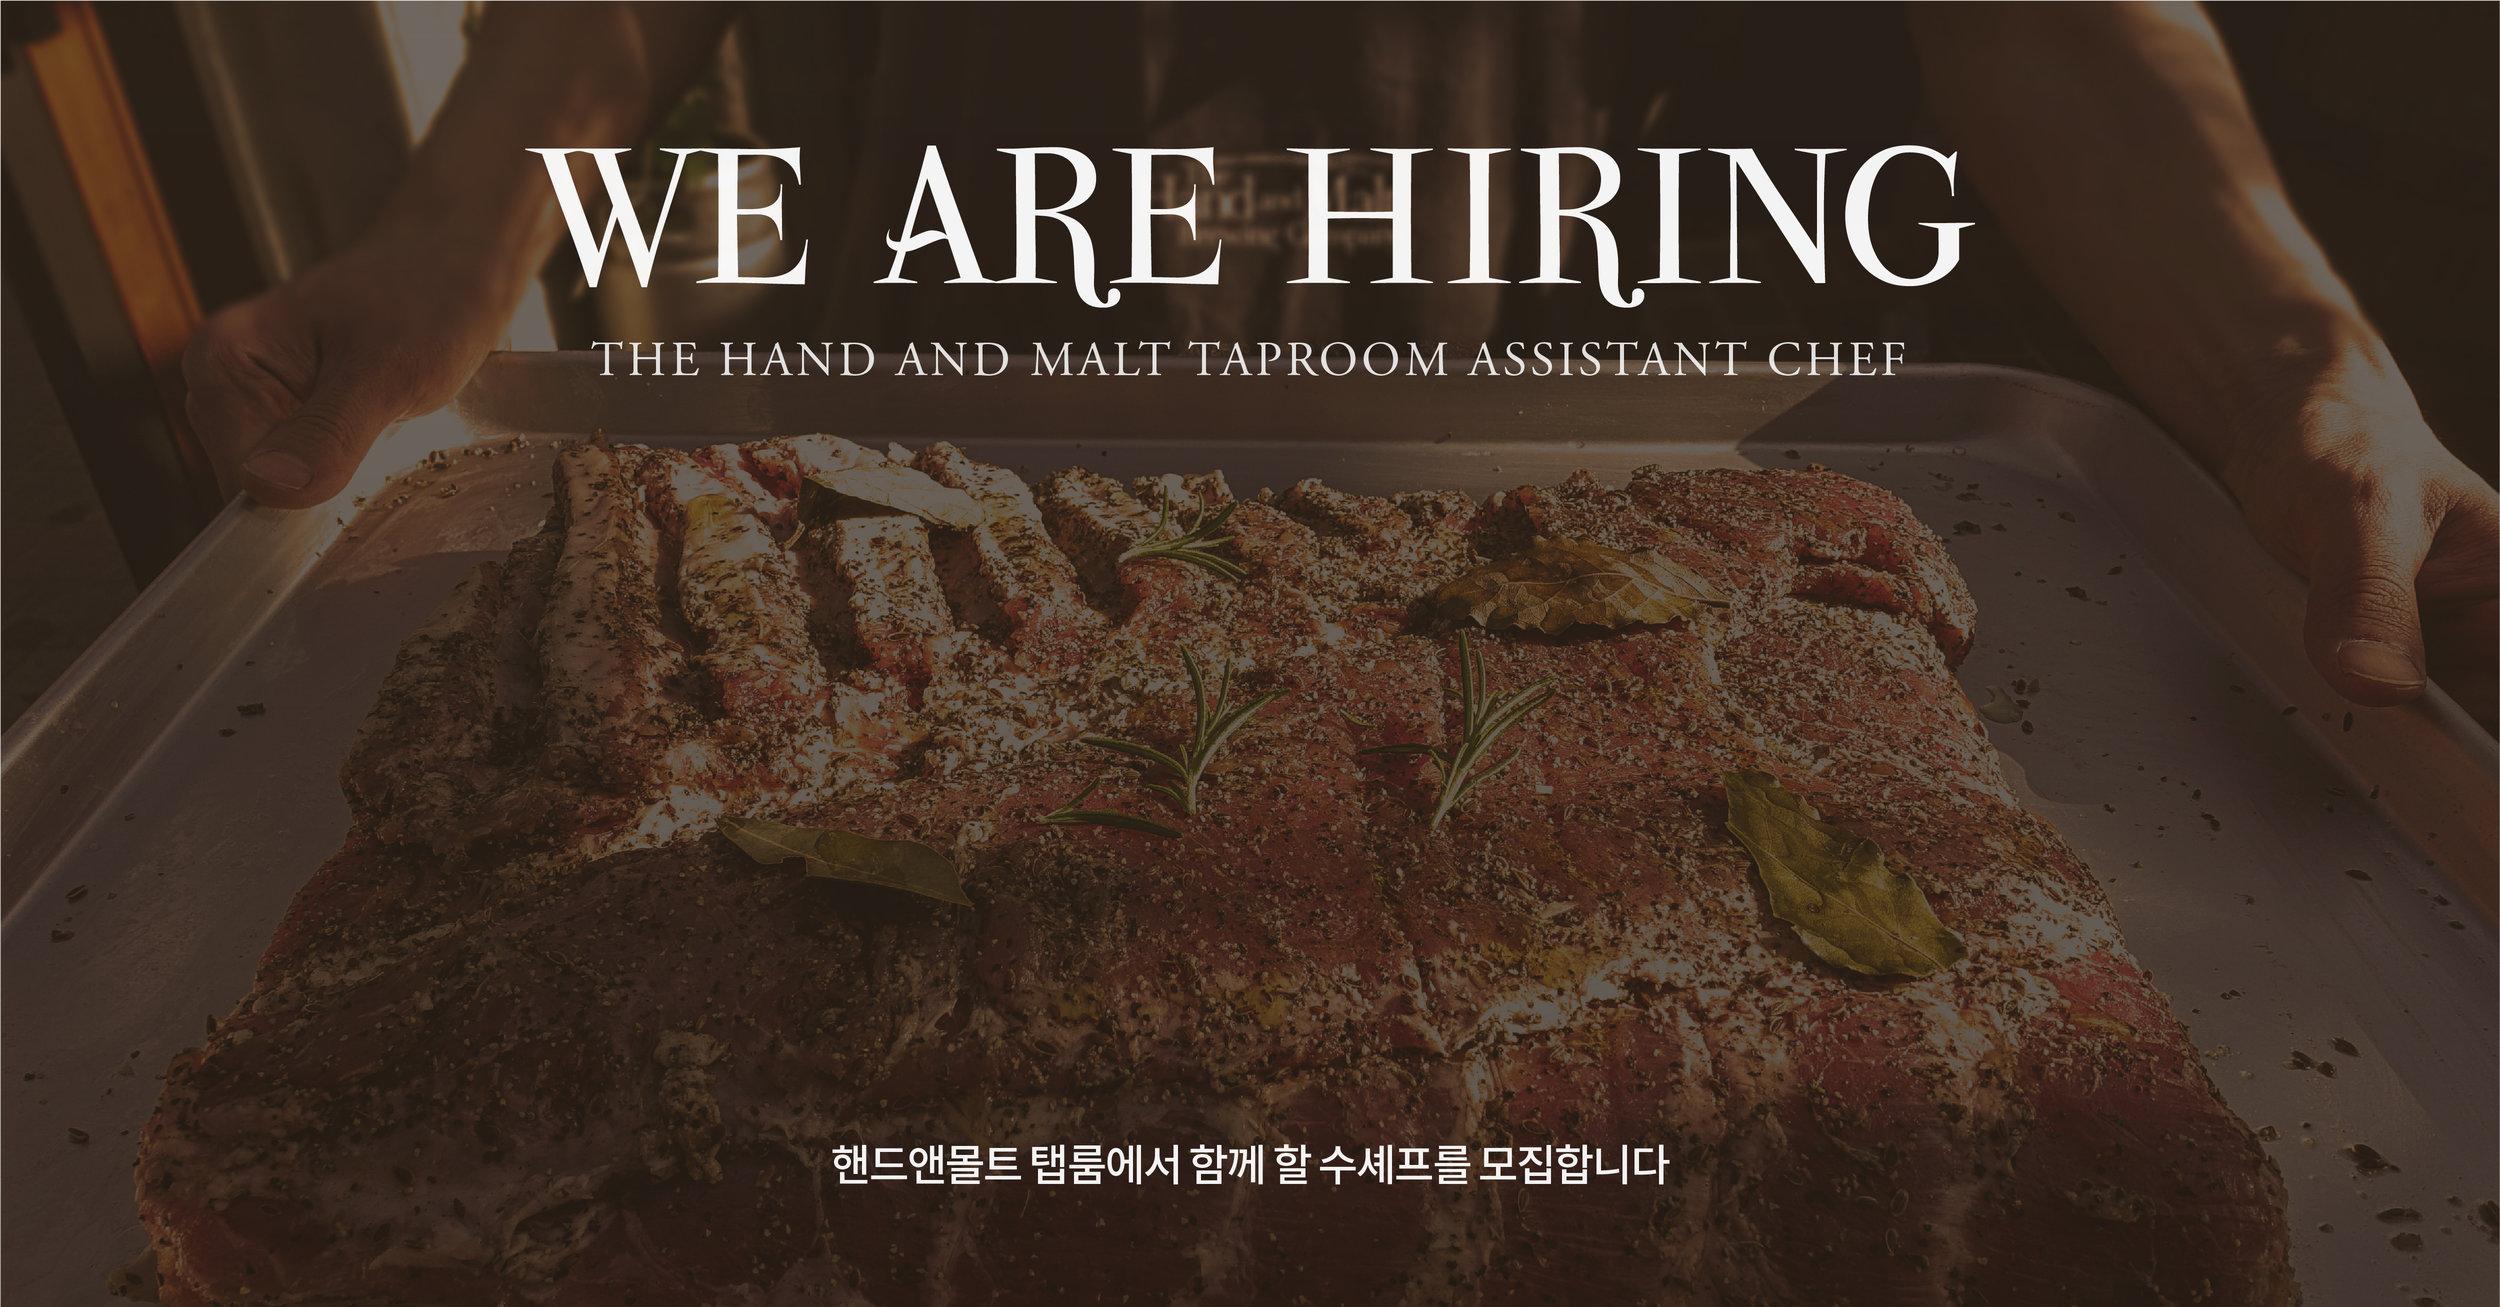 we are hiring_180717 copy-03.jpg